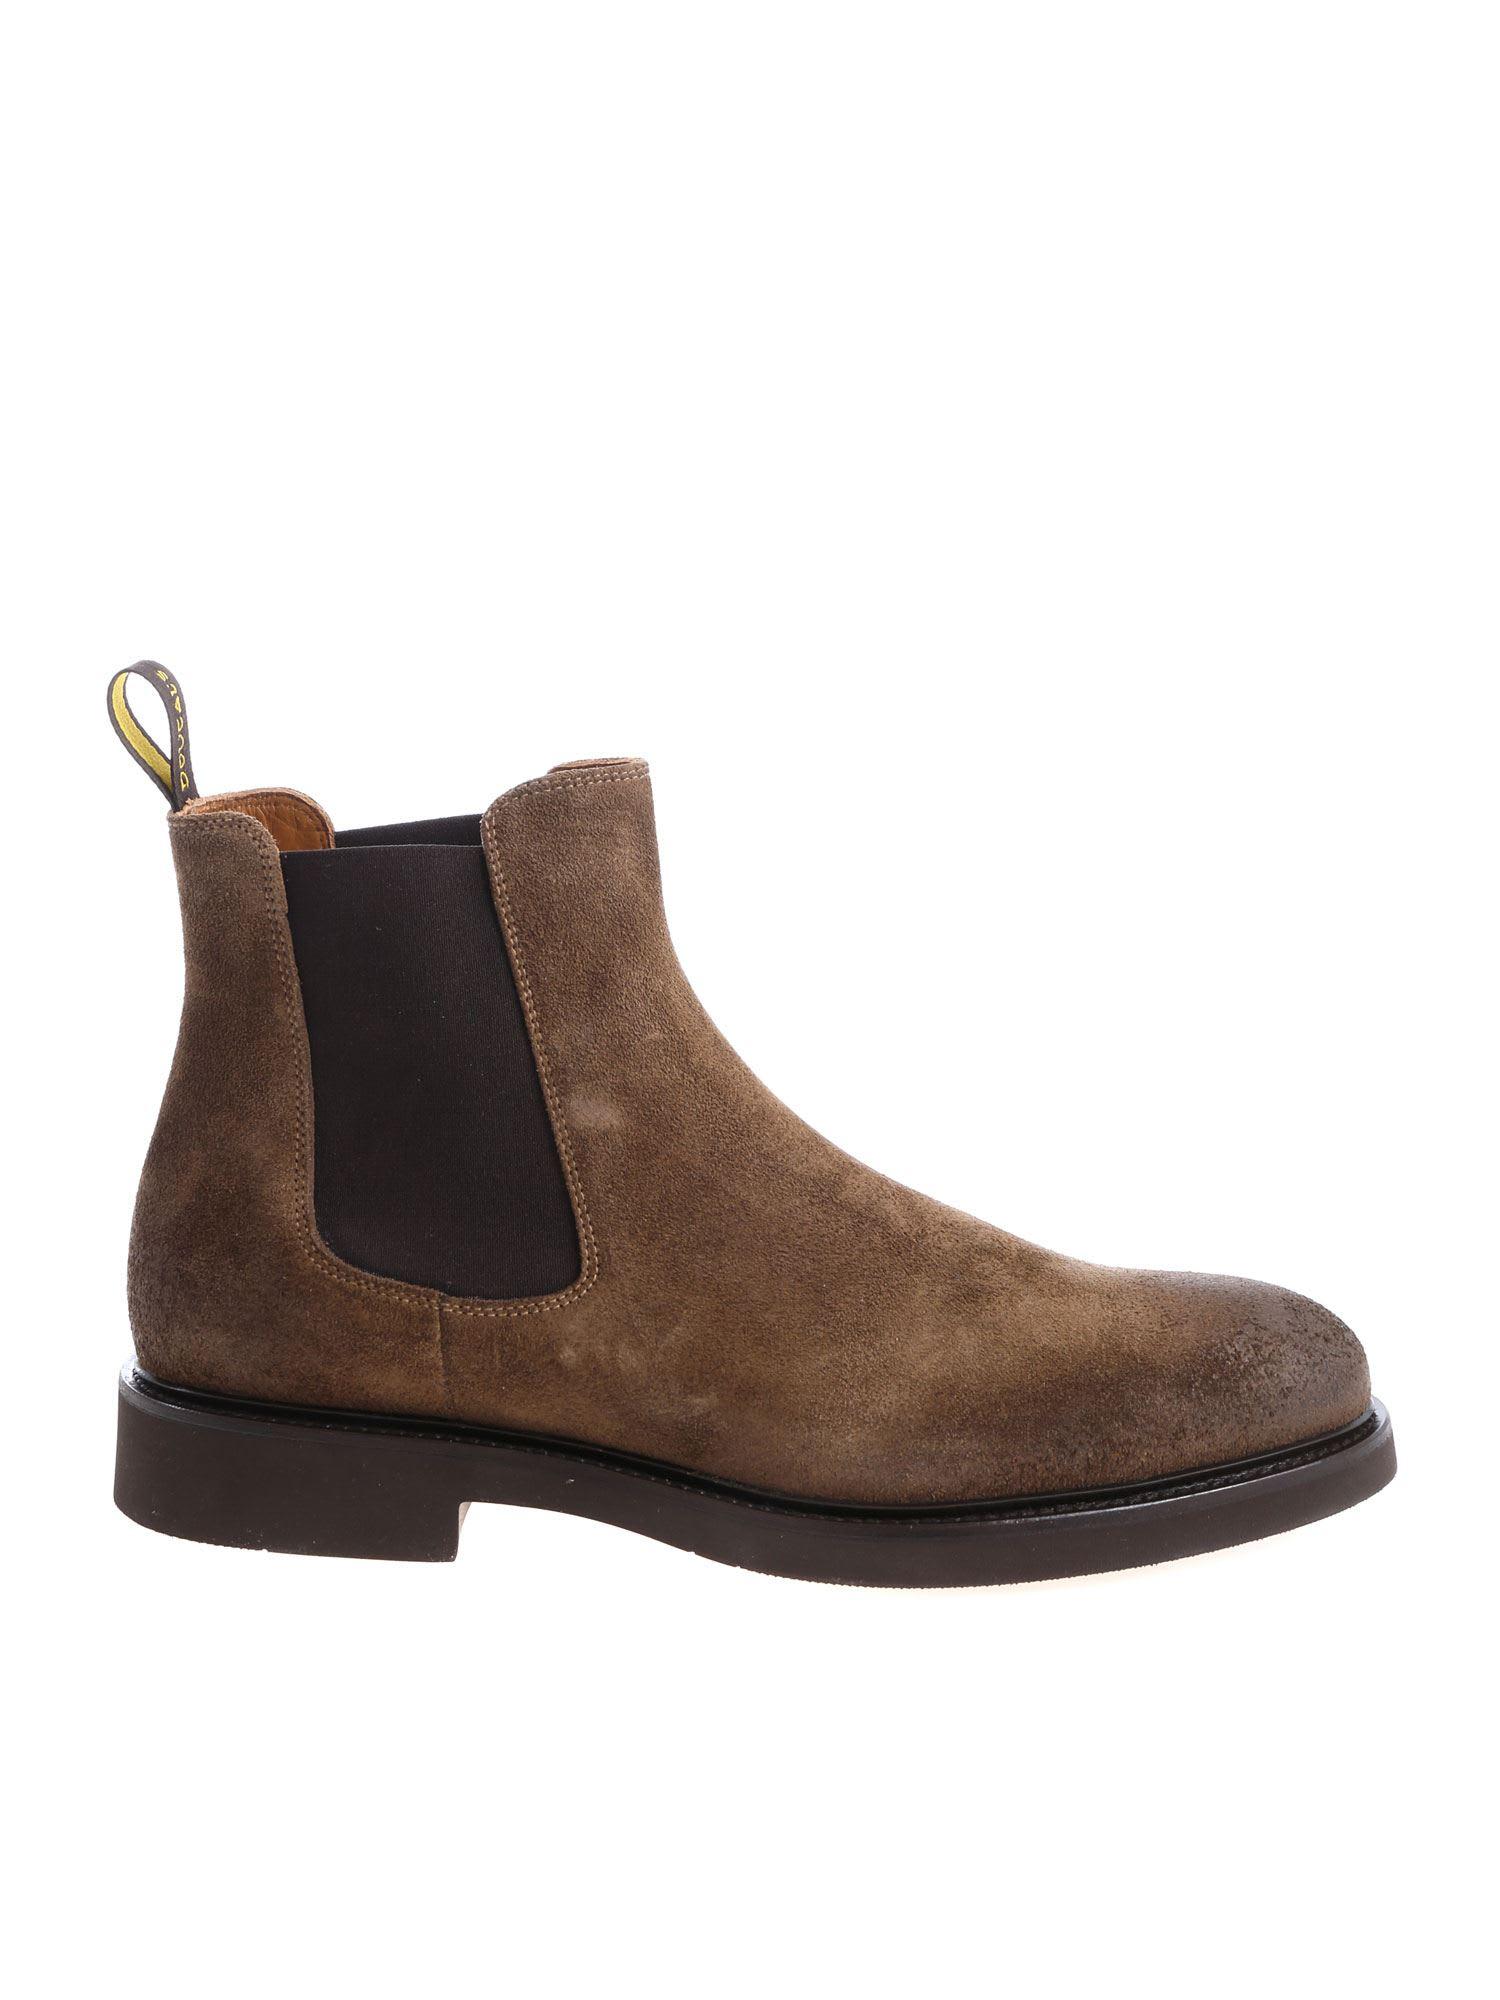 Doucals Vintage Suede Boots